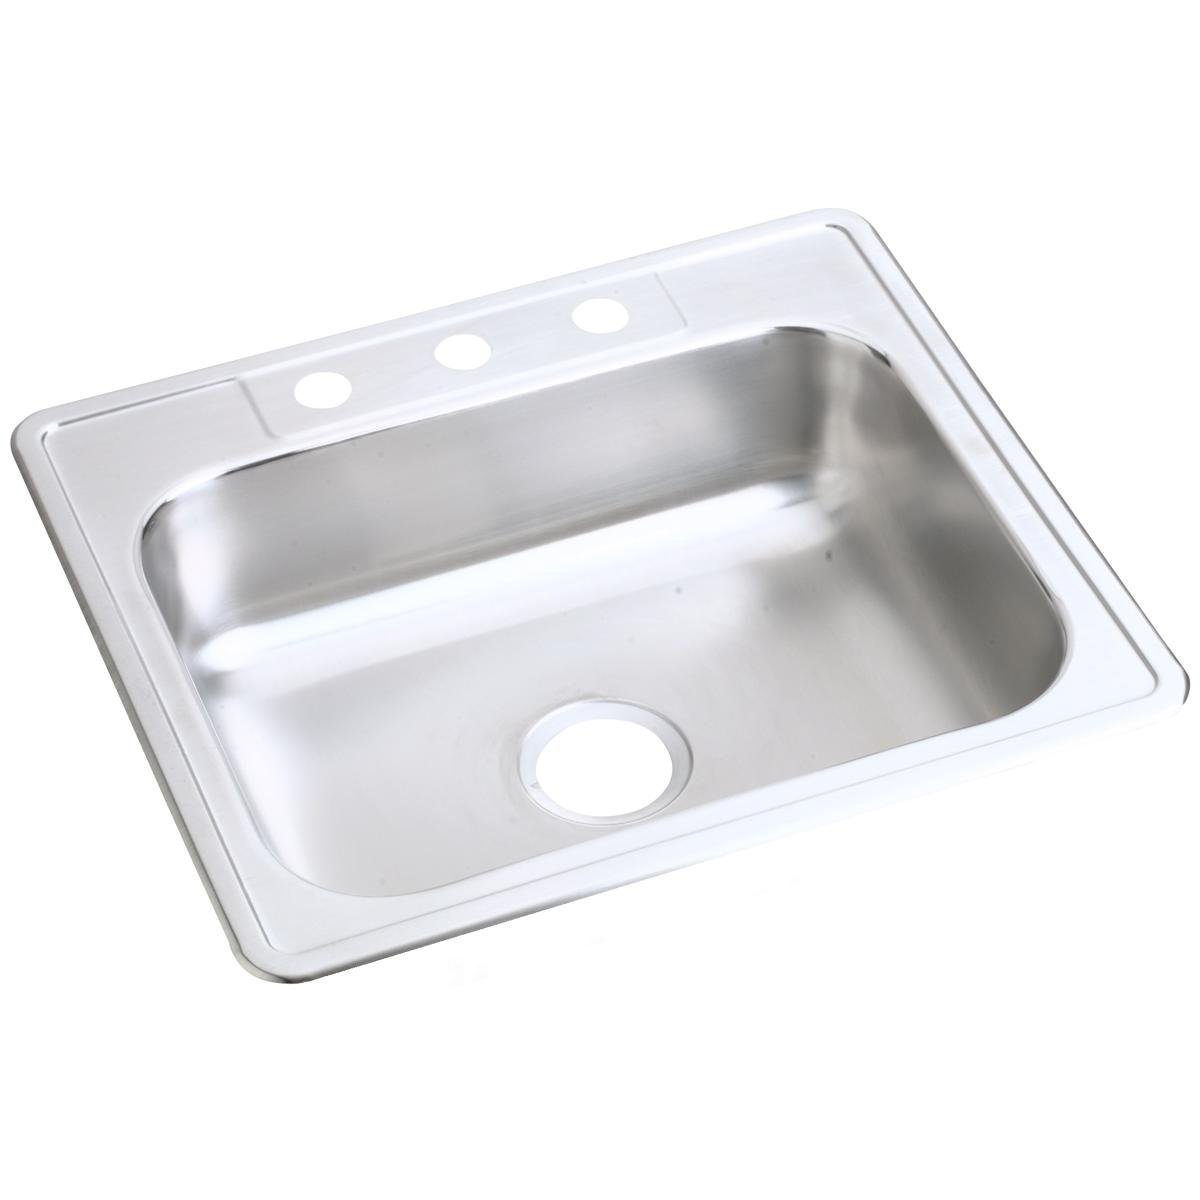 Dayton D125212 Single Bowl Drop-in Stainless Steel Sink